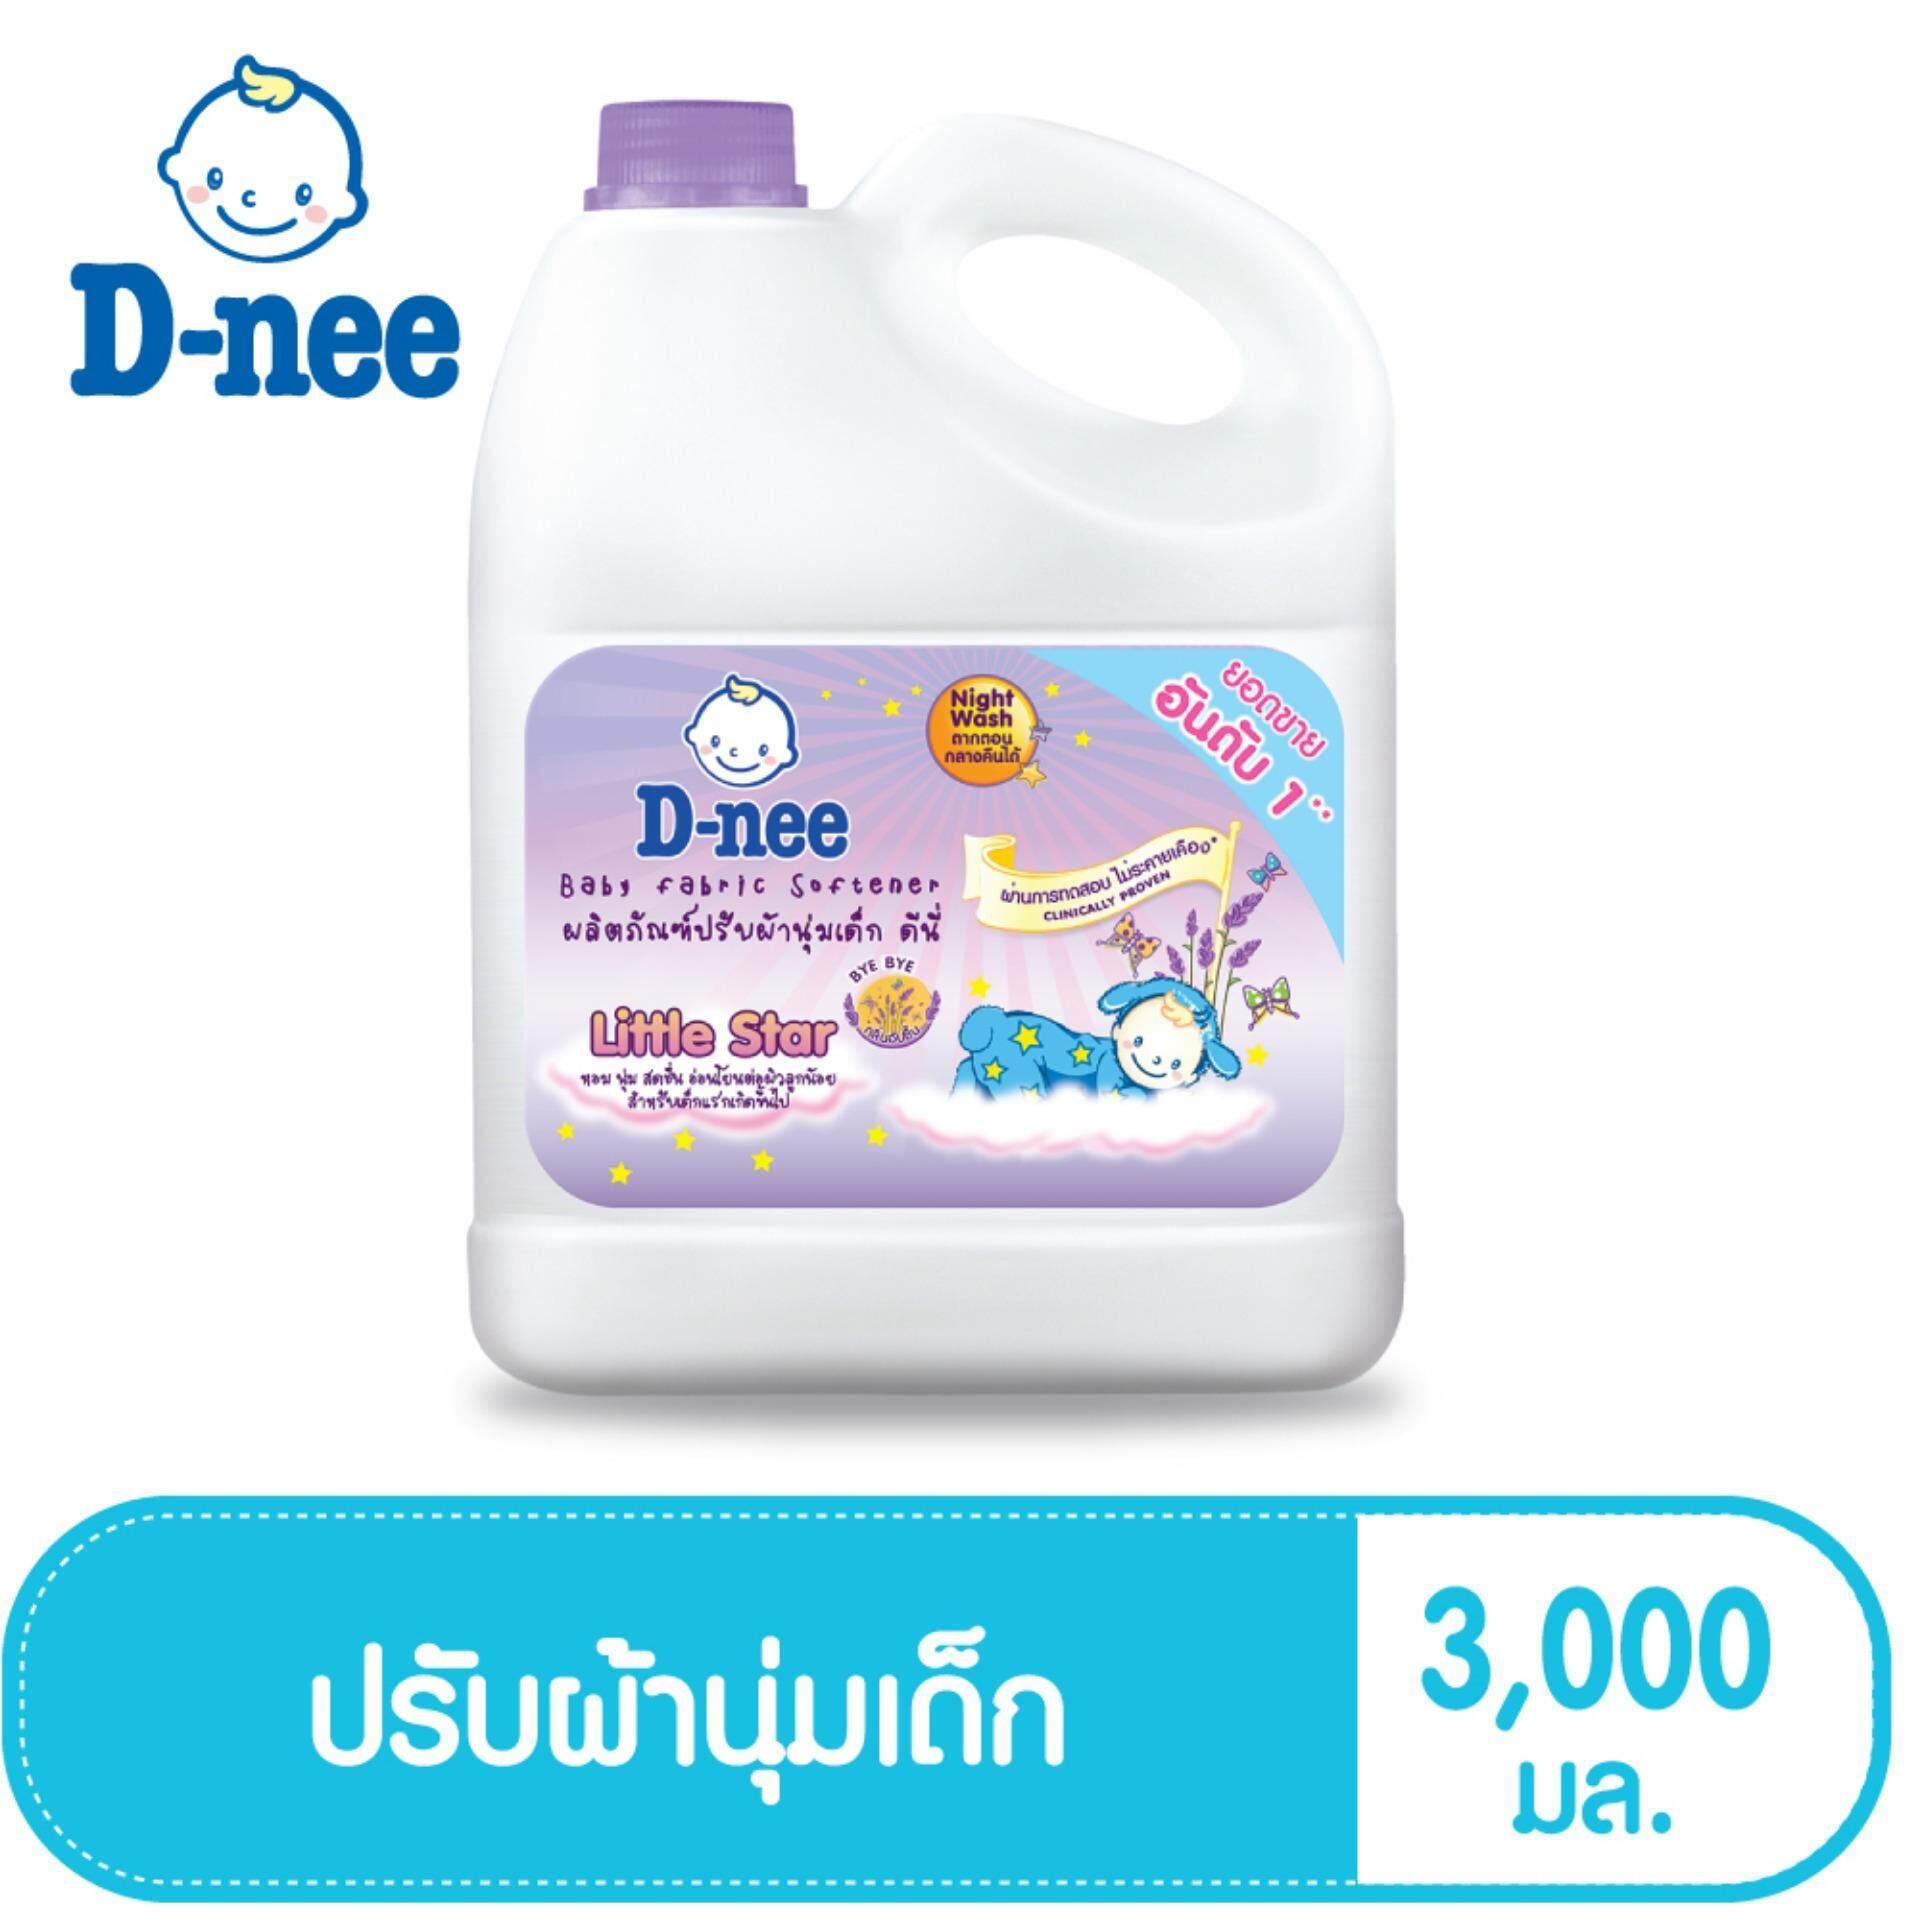 D-Nee น้ำยาปรับผ้านุ่ม สูตรซักกลางคืน แบบแกลลอน 3000 มล. By Lazada Retail D-Nee.